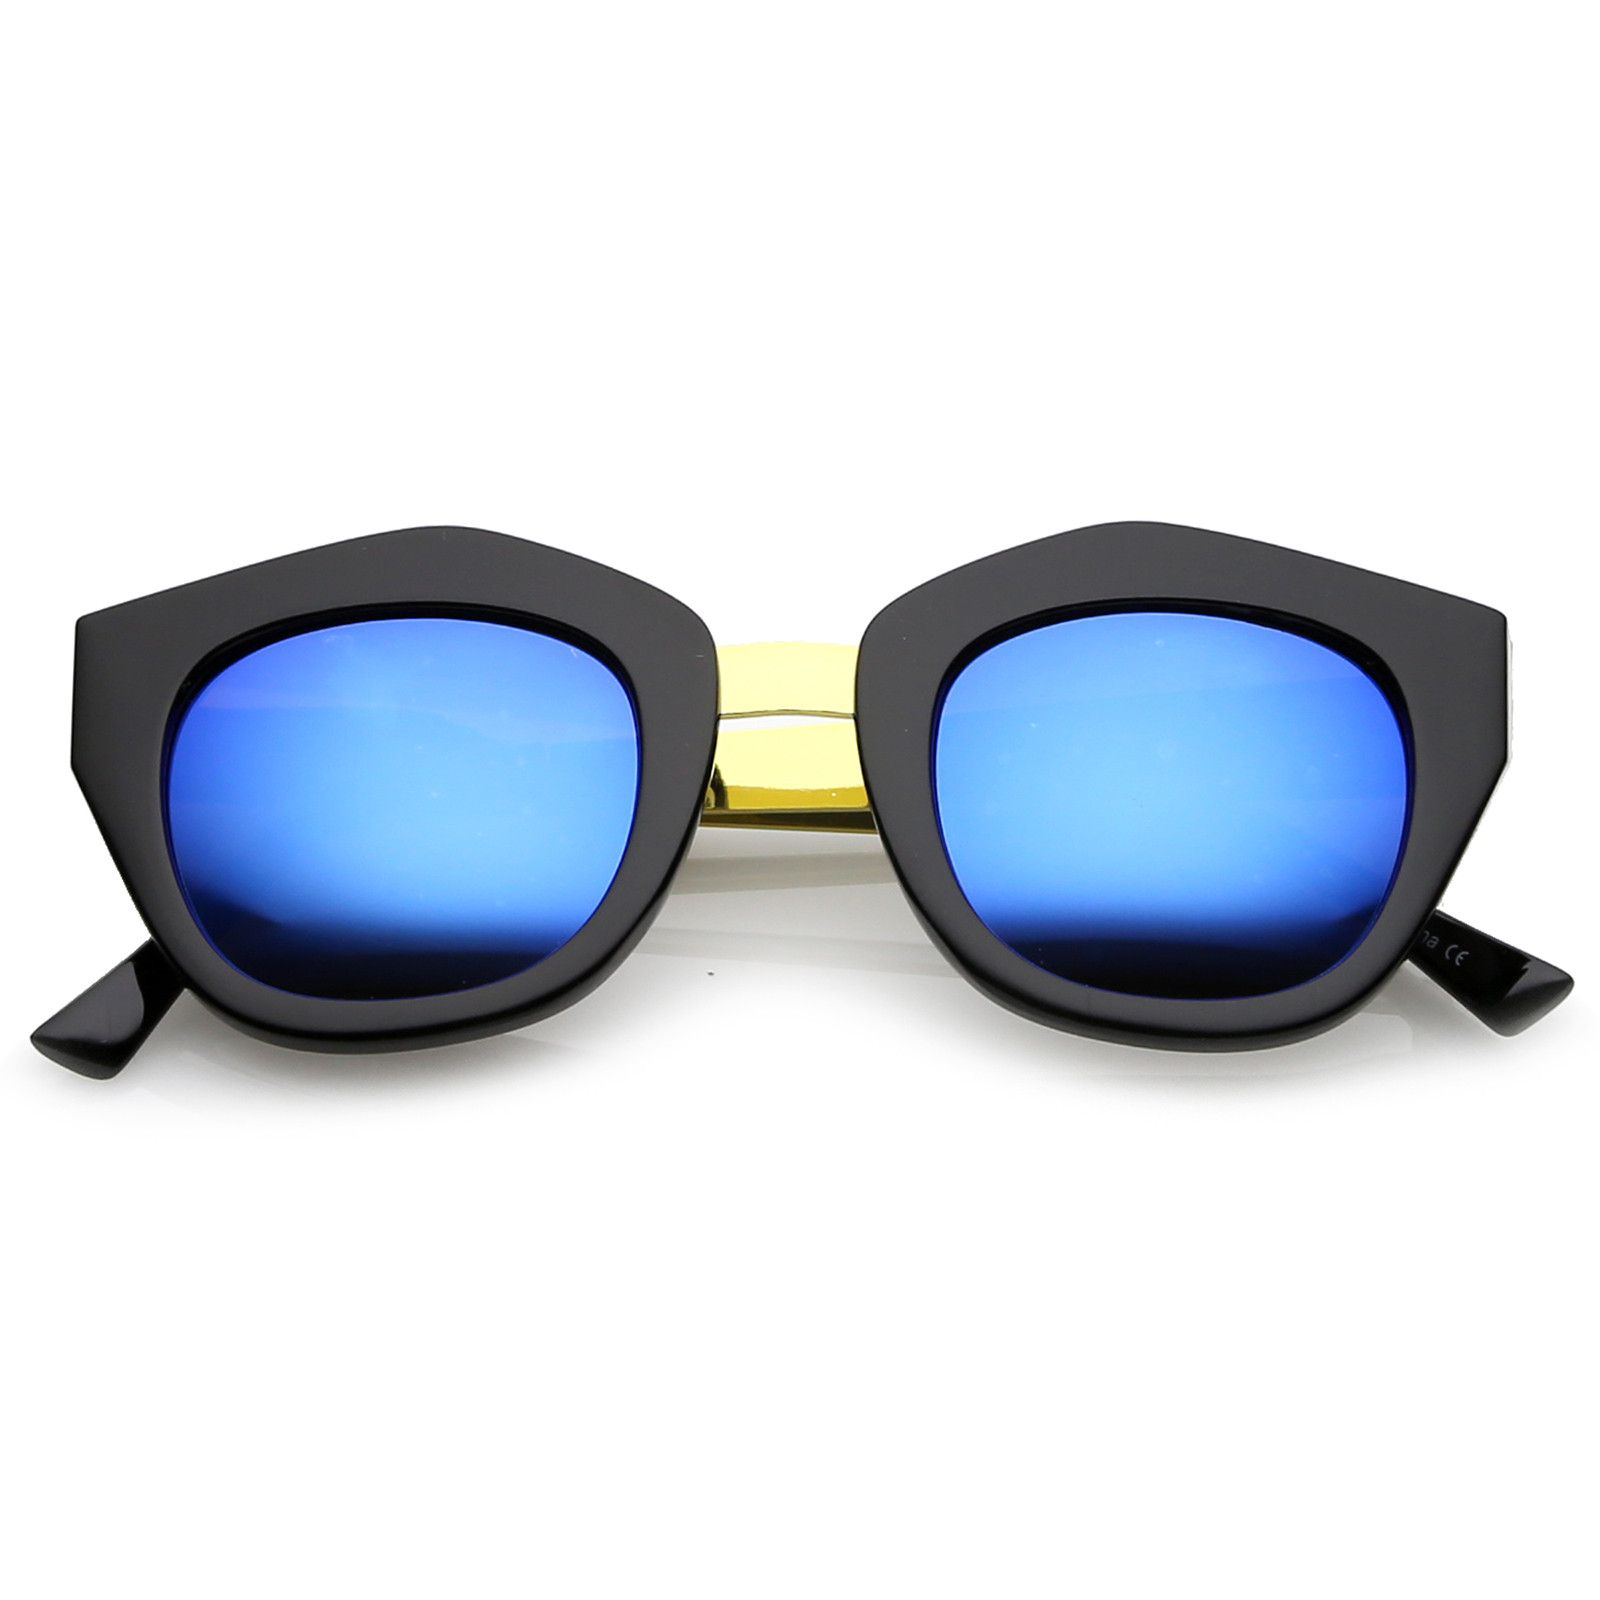 396fca937c2 Women s Metal Bridge Colored Mirror Lens Square Cat Eye Sunglasses 46mm   sunglasses  frame  sunglass  bold  clear  sunglassla  summer  mirrored   cateye   ...